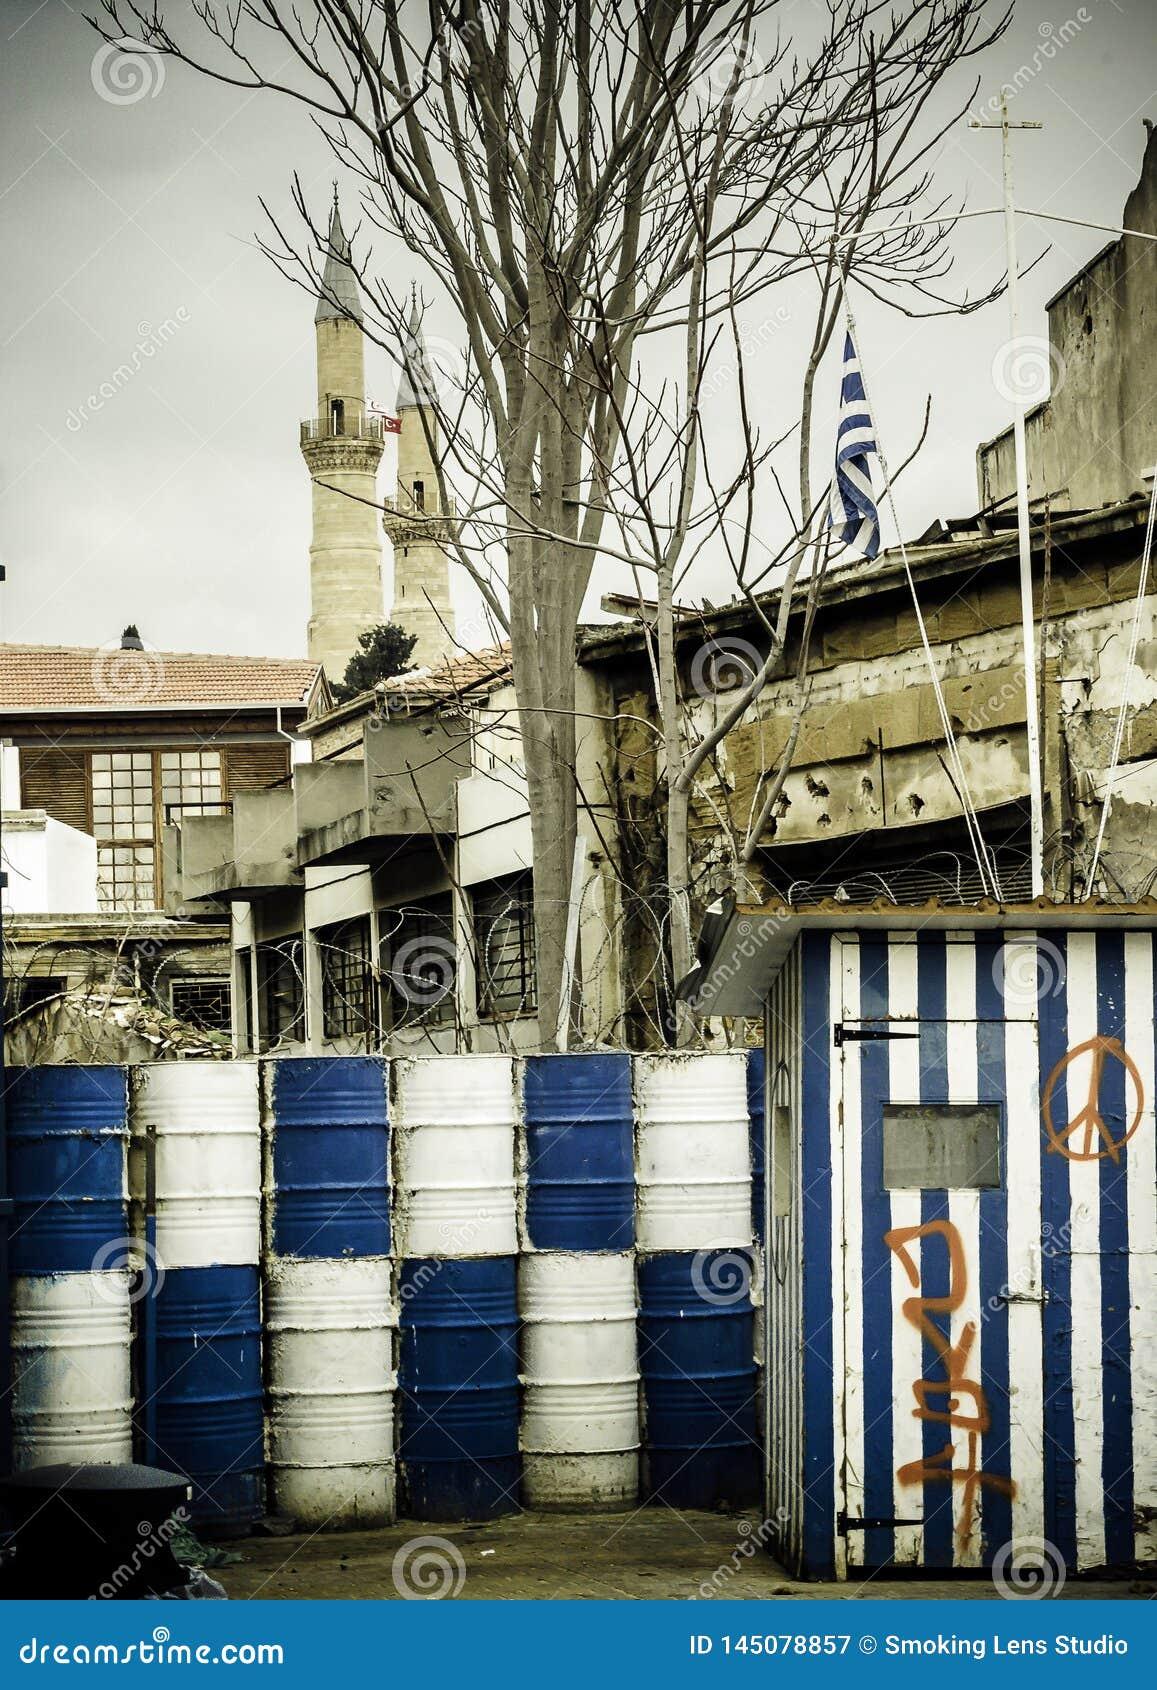 Î arricade在两部分中分离塞浦路斯,桶becide卫兵